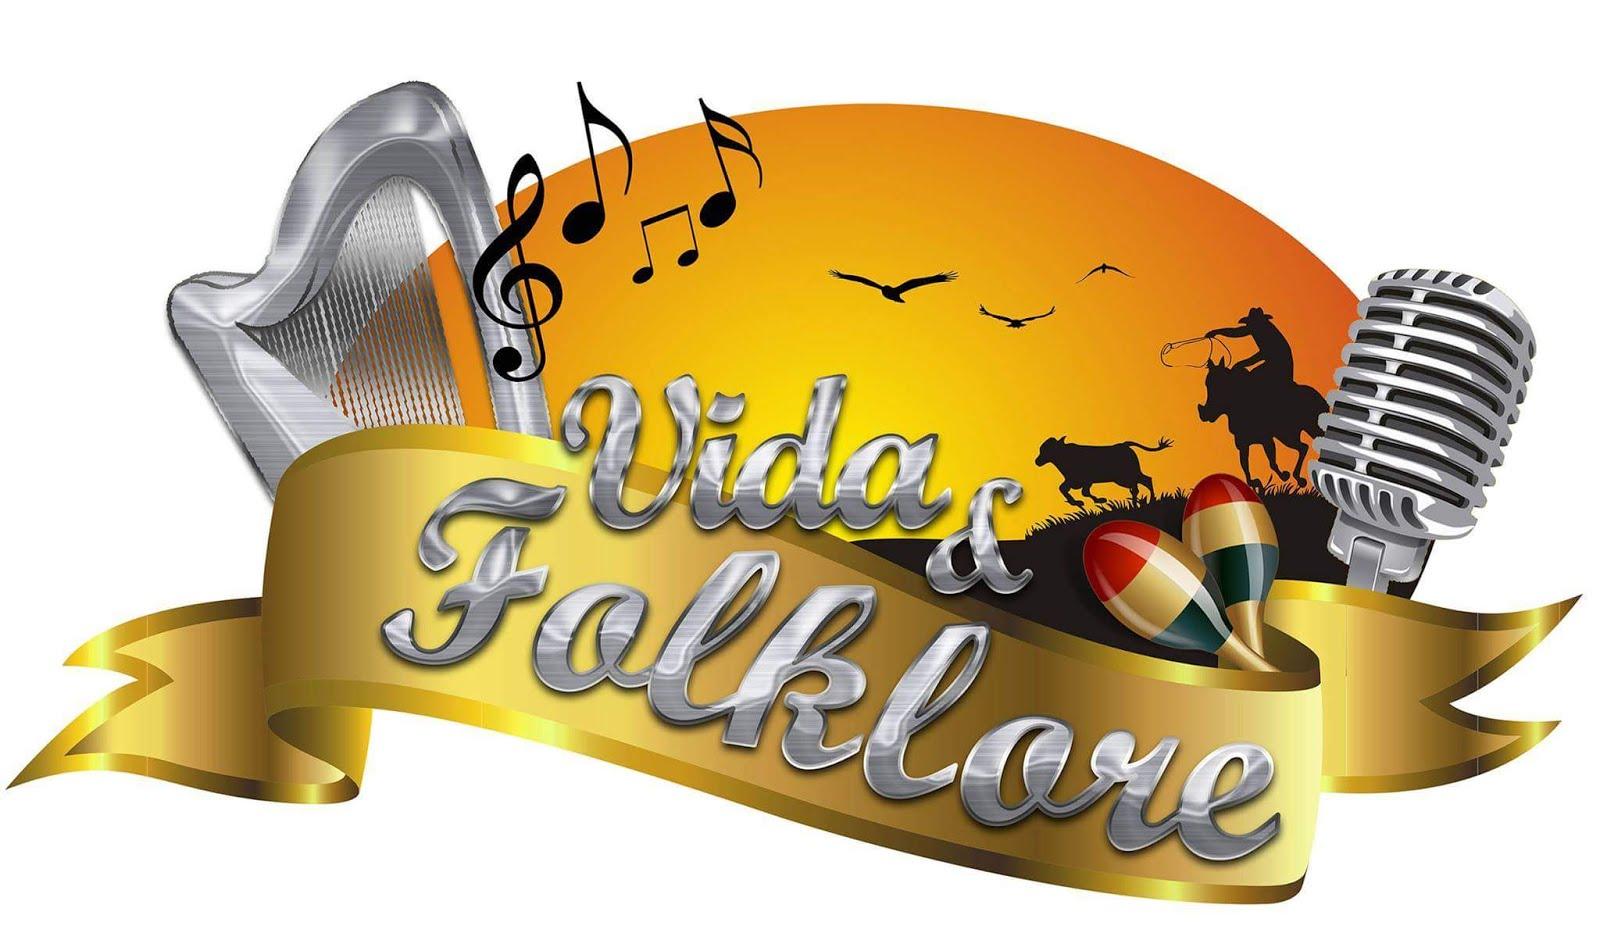 Programa Radial Vida y Folklore